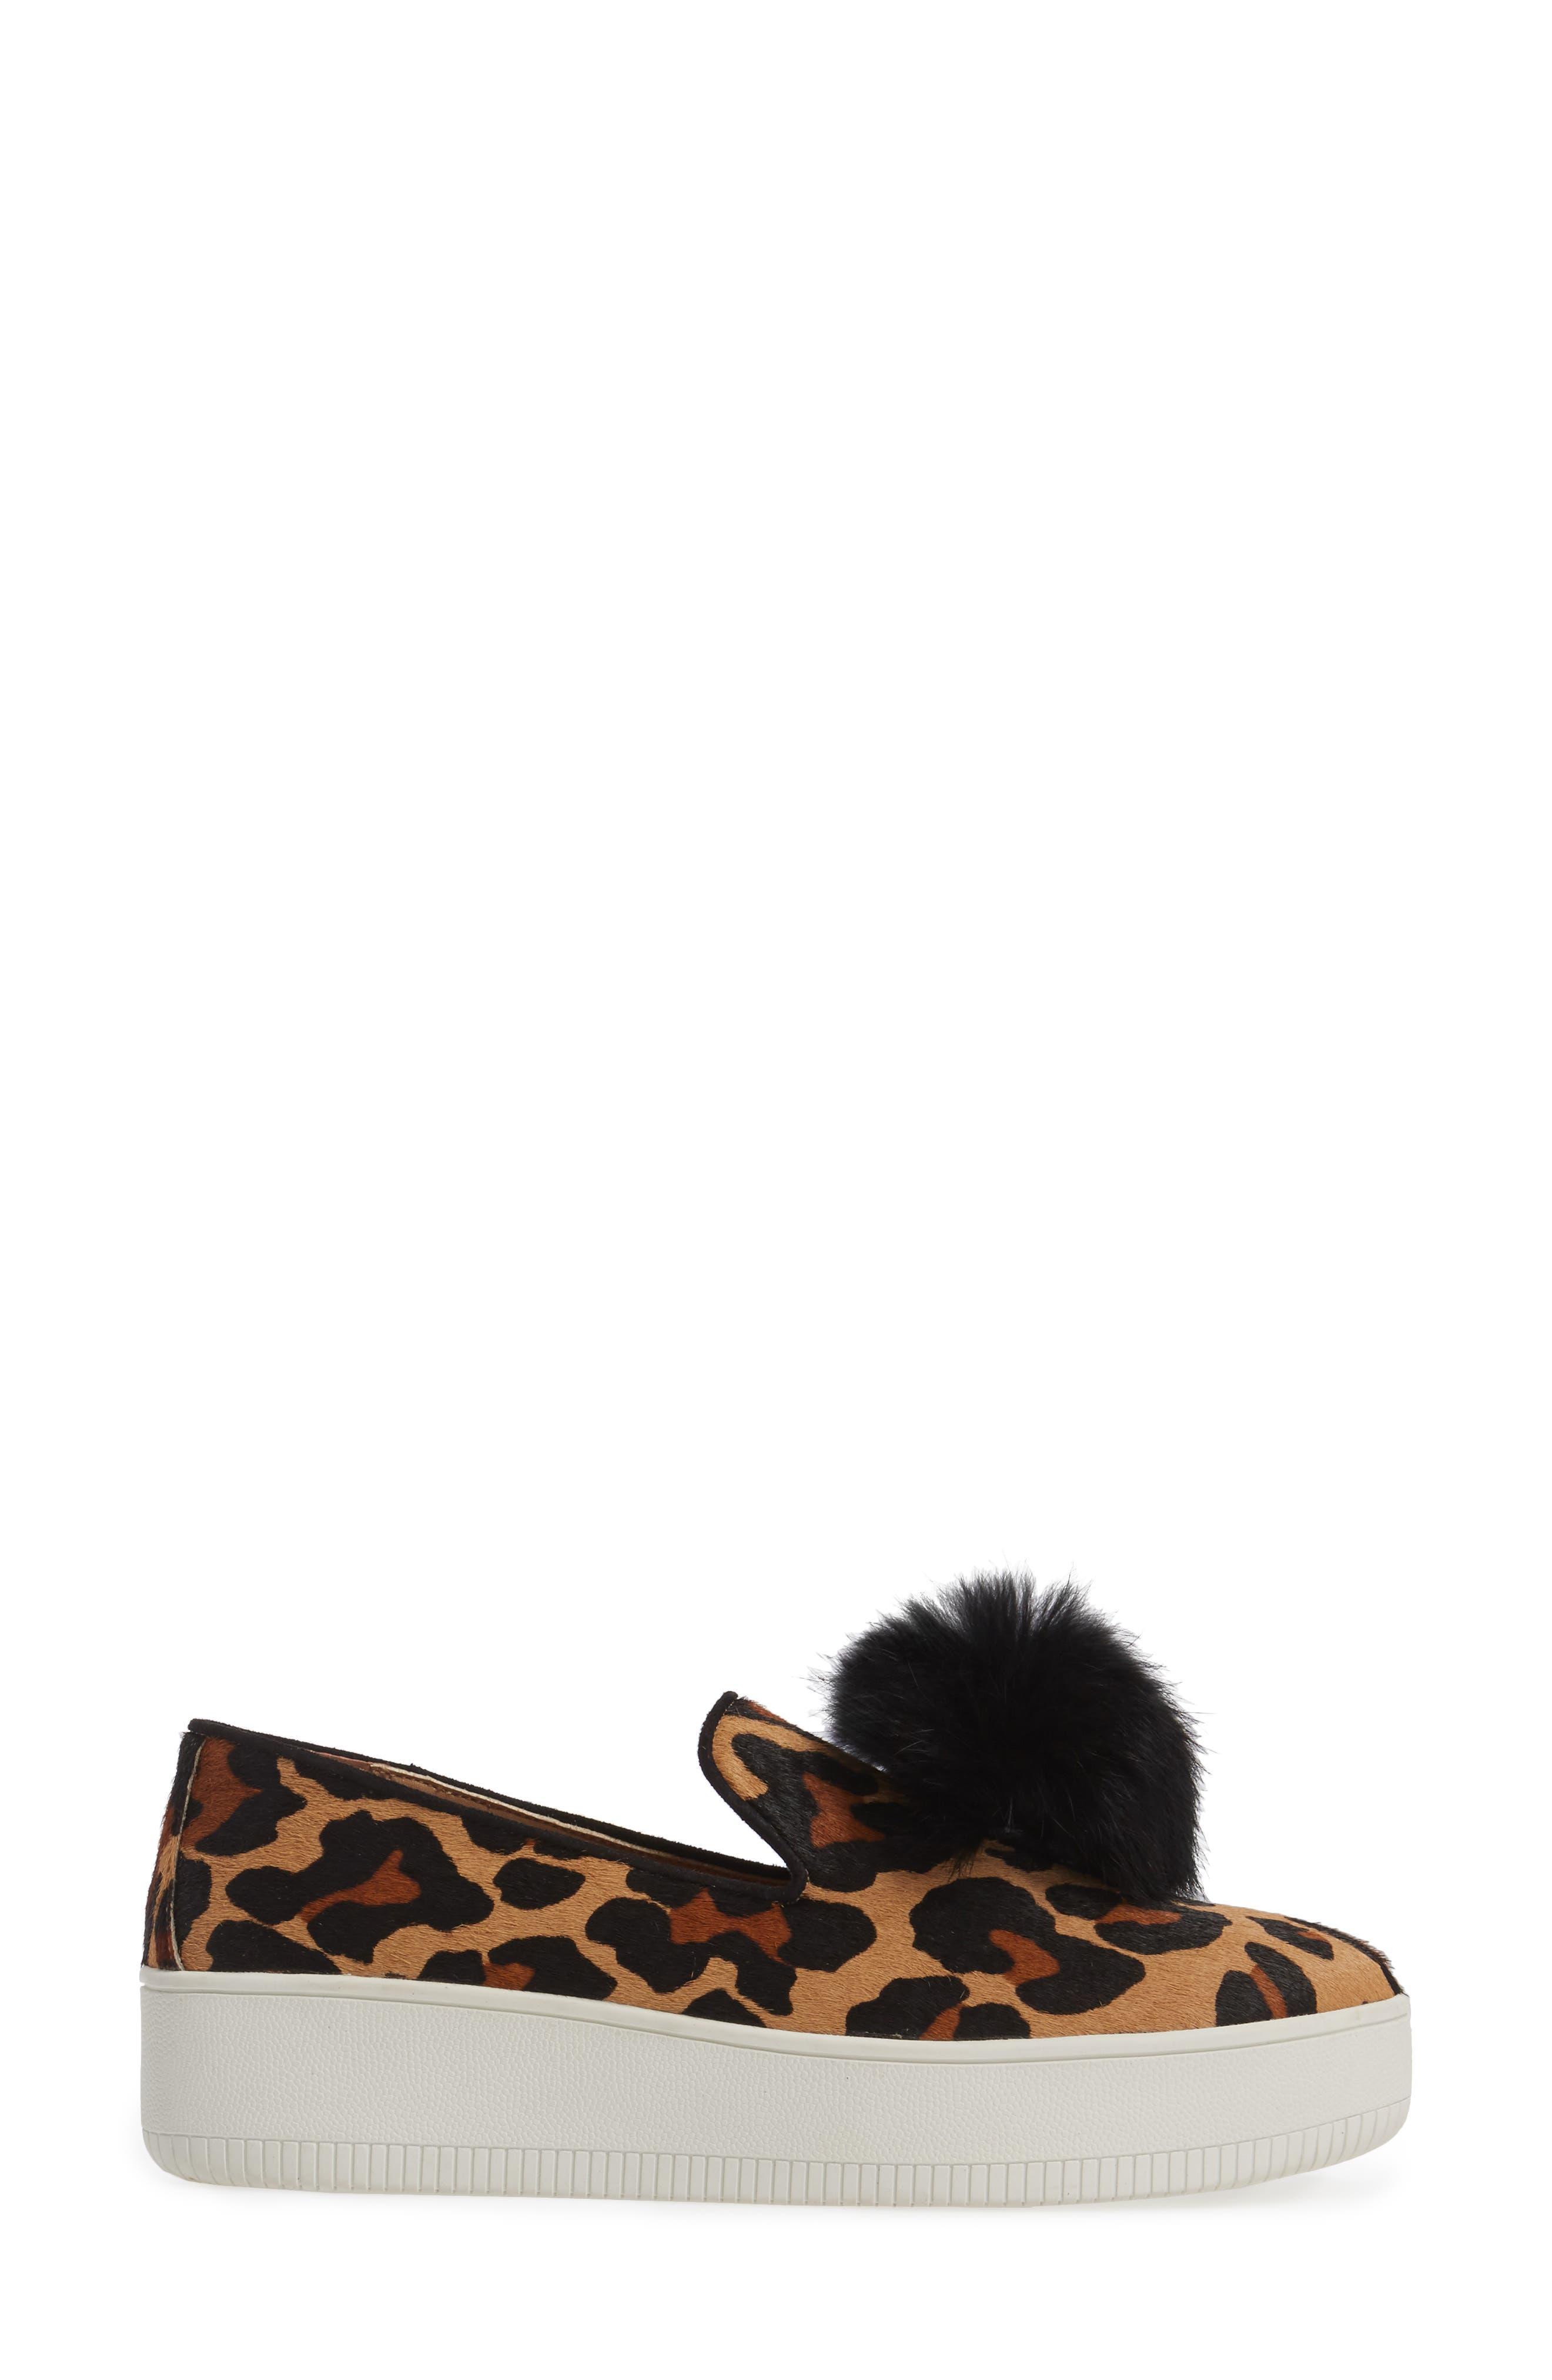 Sammy II Genuine Calf Hair Platform Sneaker with Genuine Rabbit Fur Trim,                             Alternate thumbnail 3, color,                             215